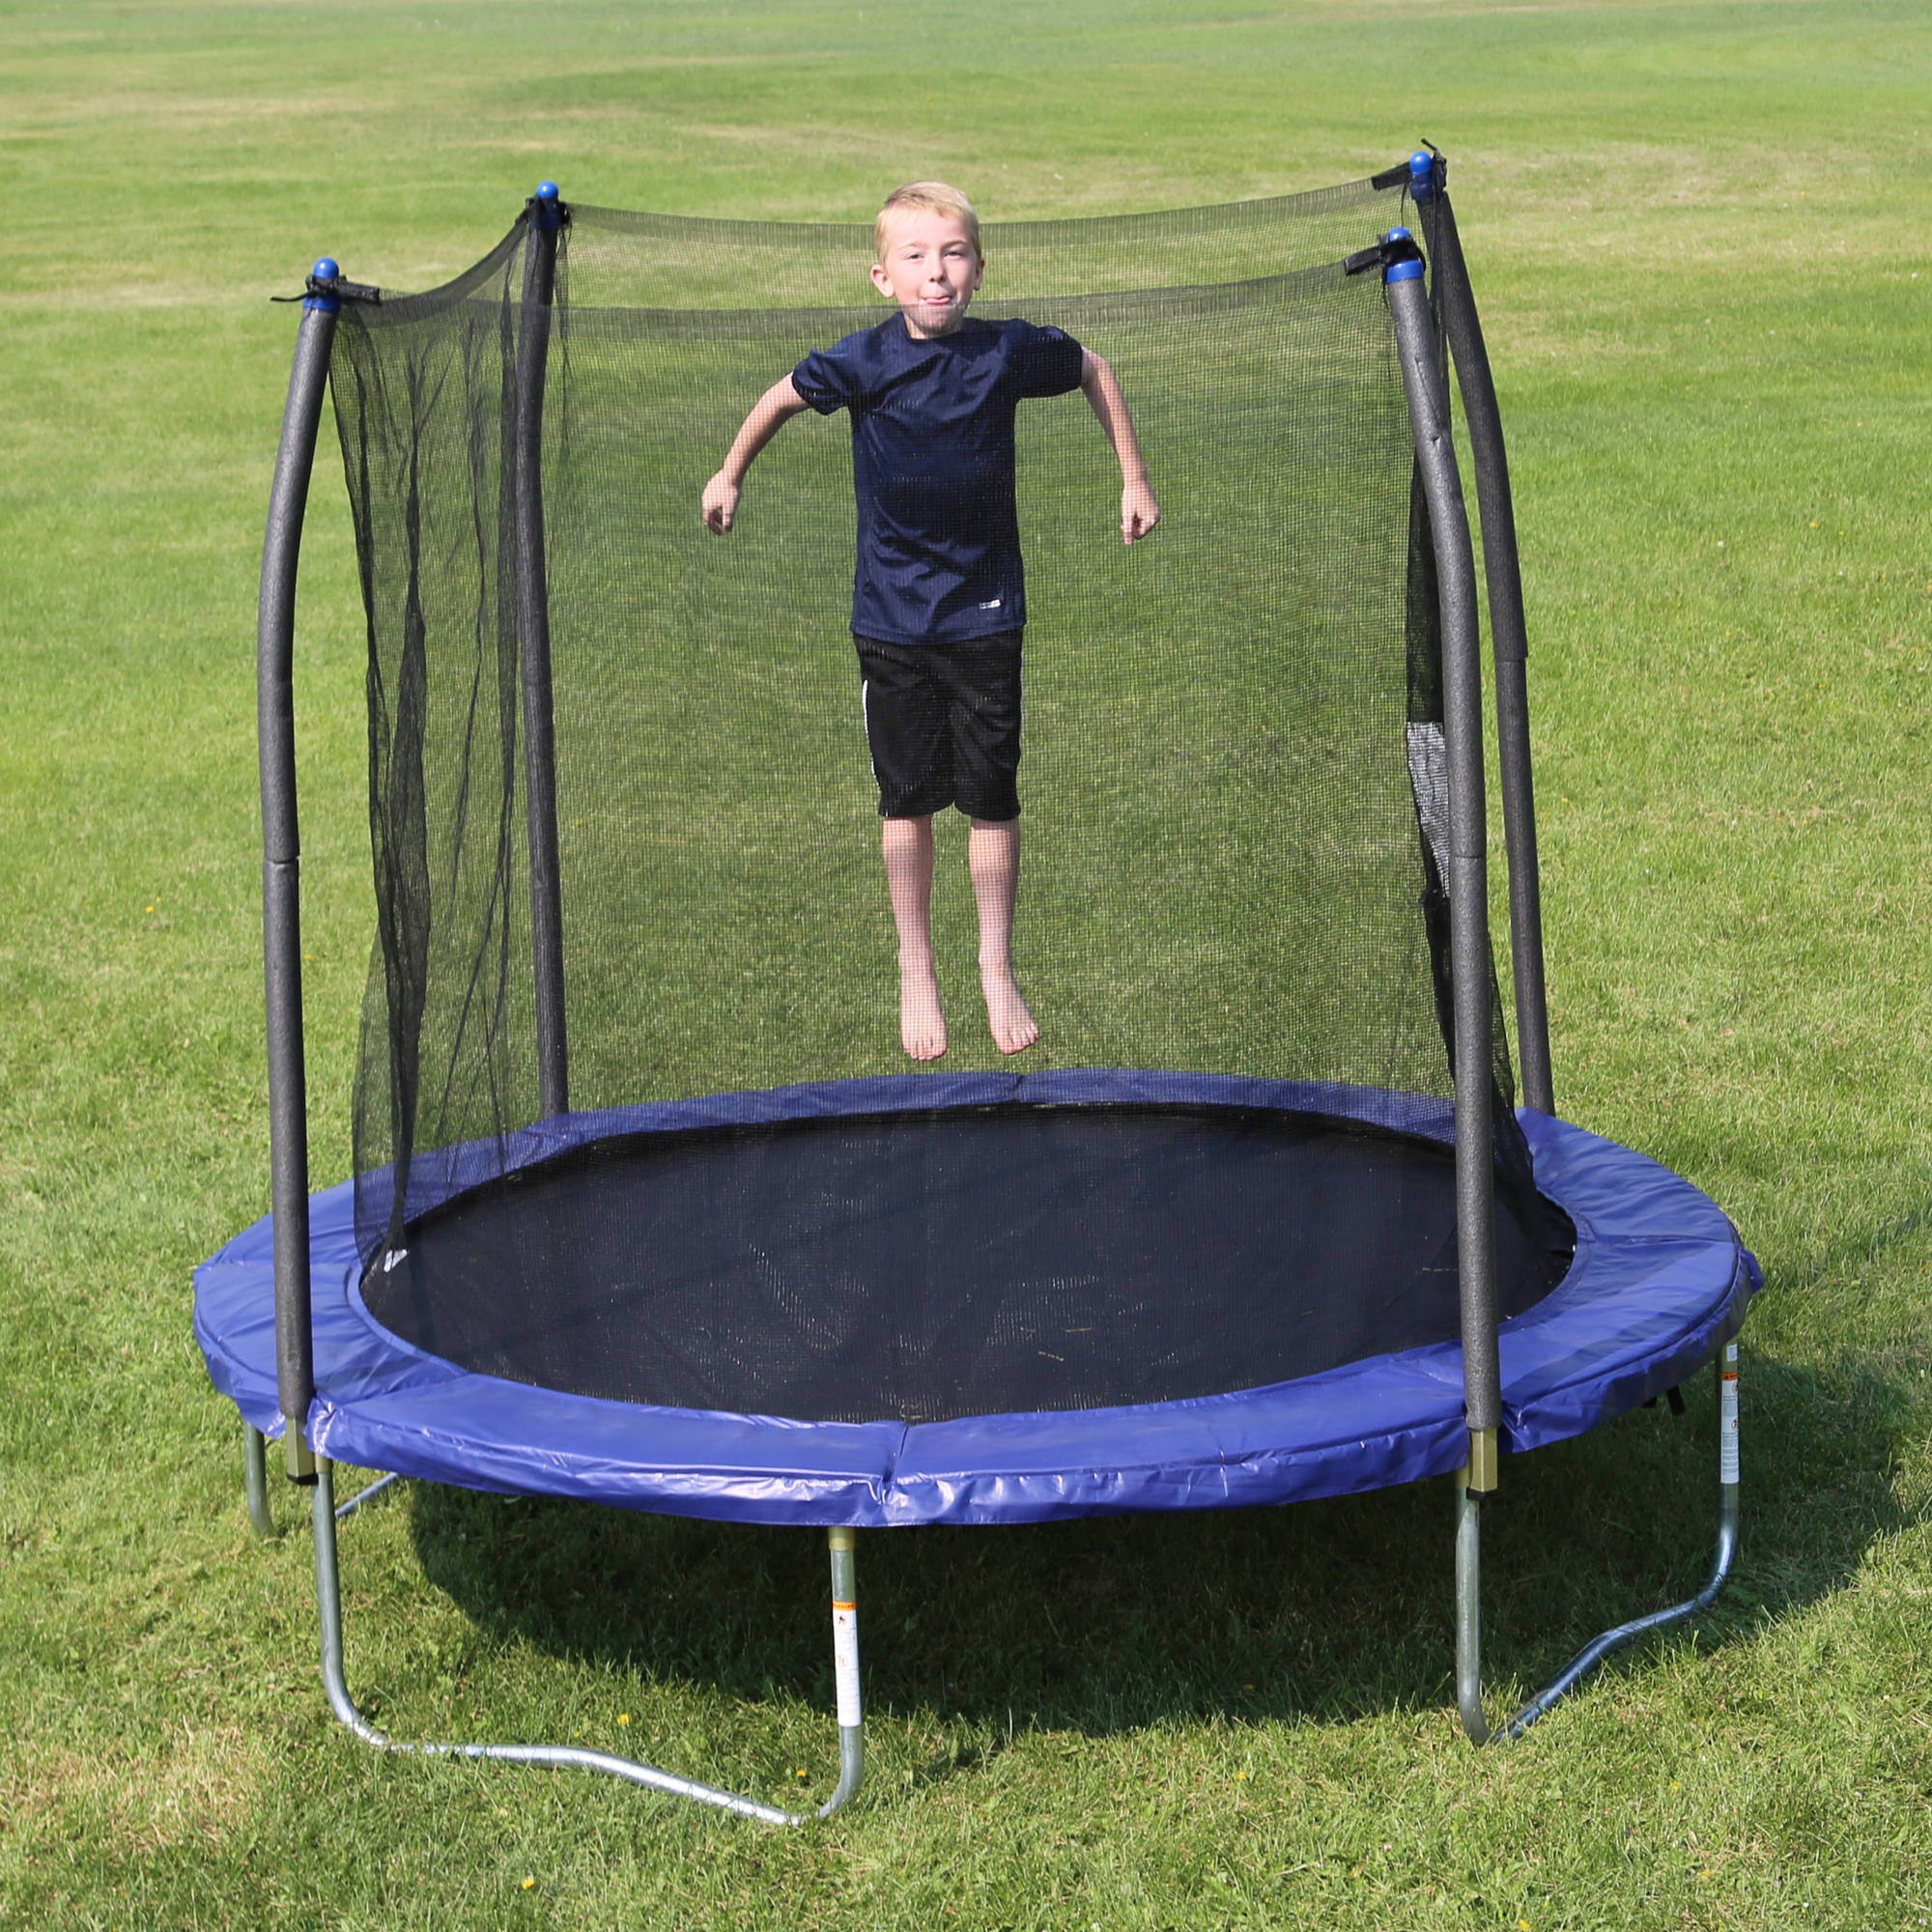 Skywalker Trampolines 8' Round Trampoline with Safety Enclosure ...